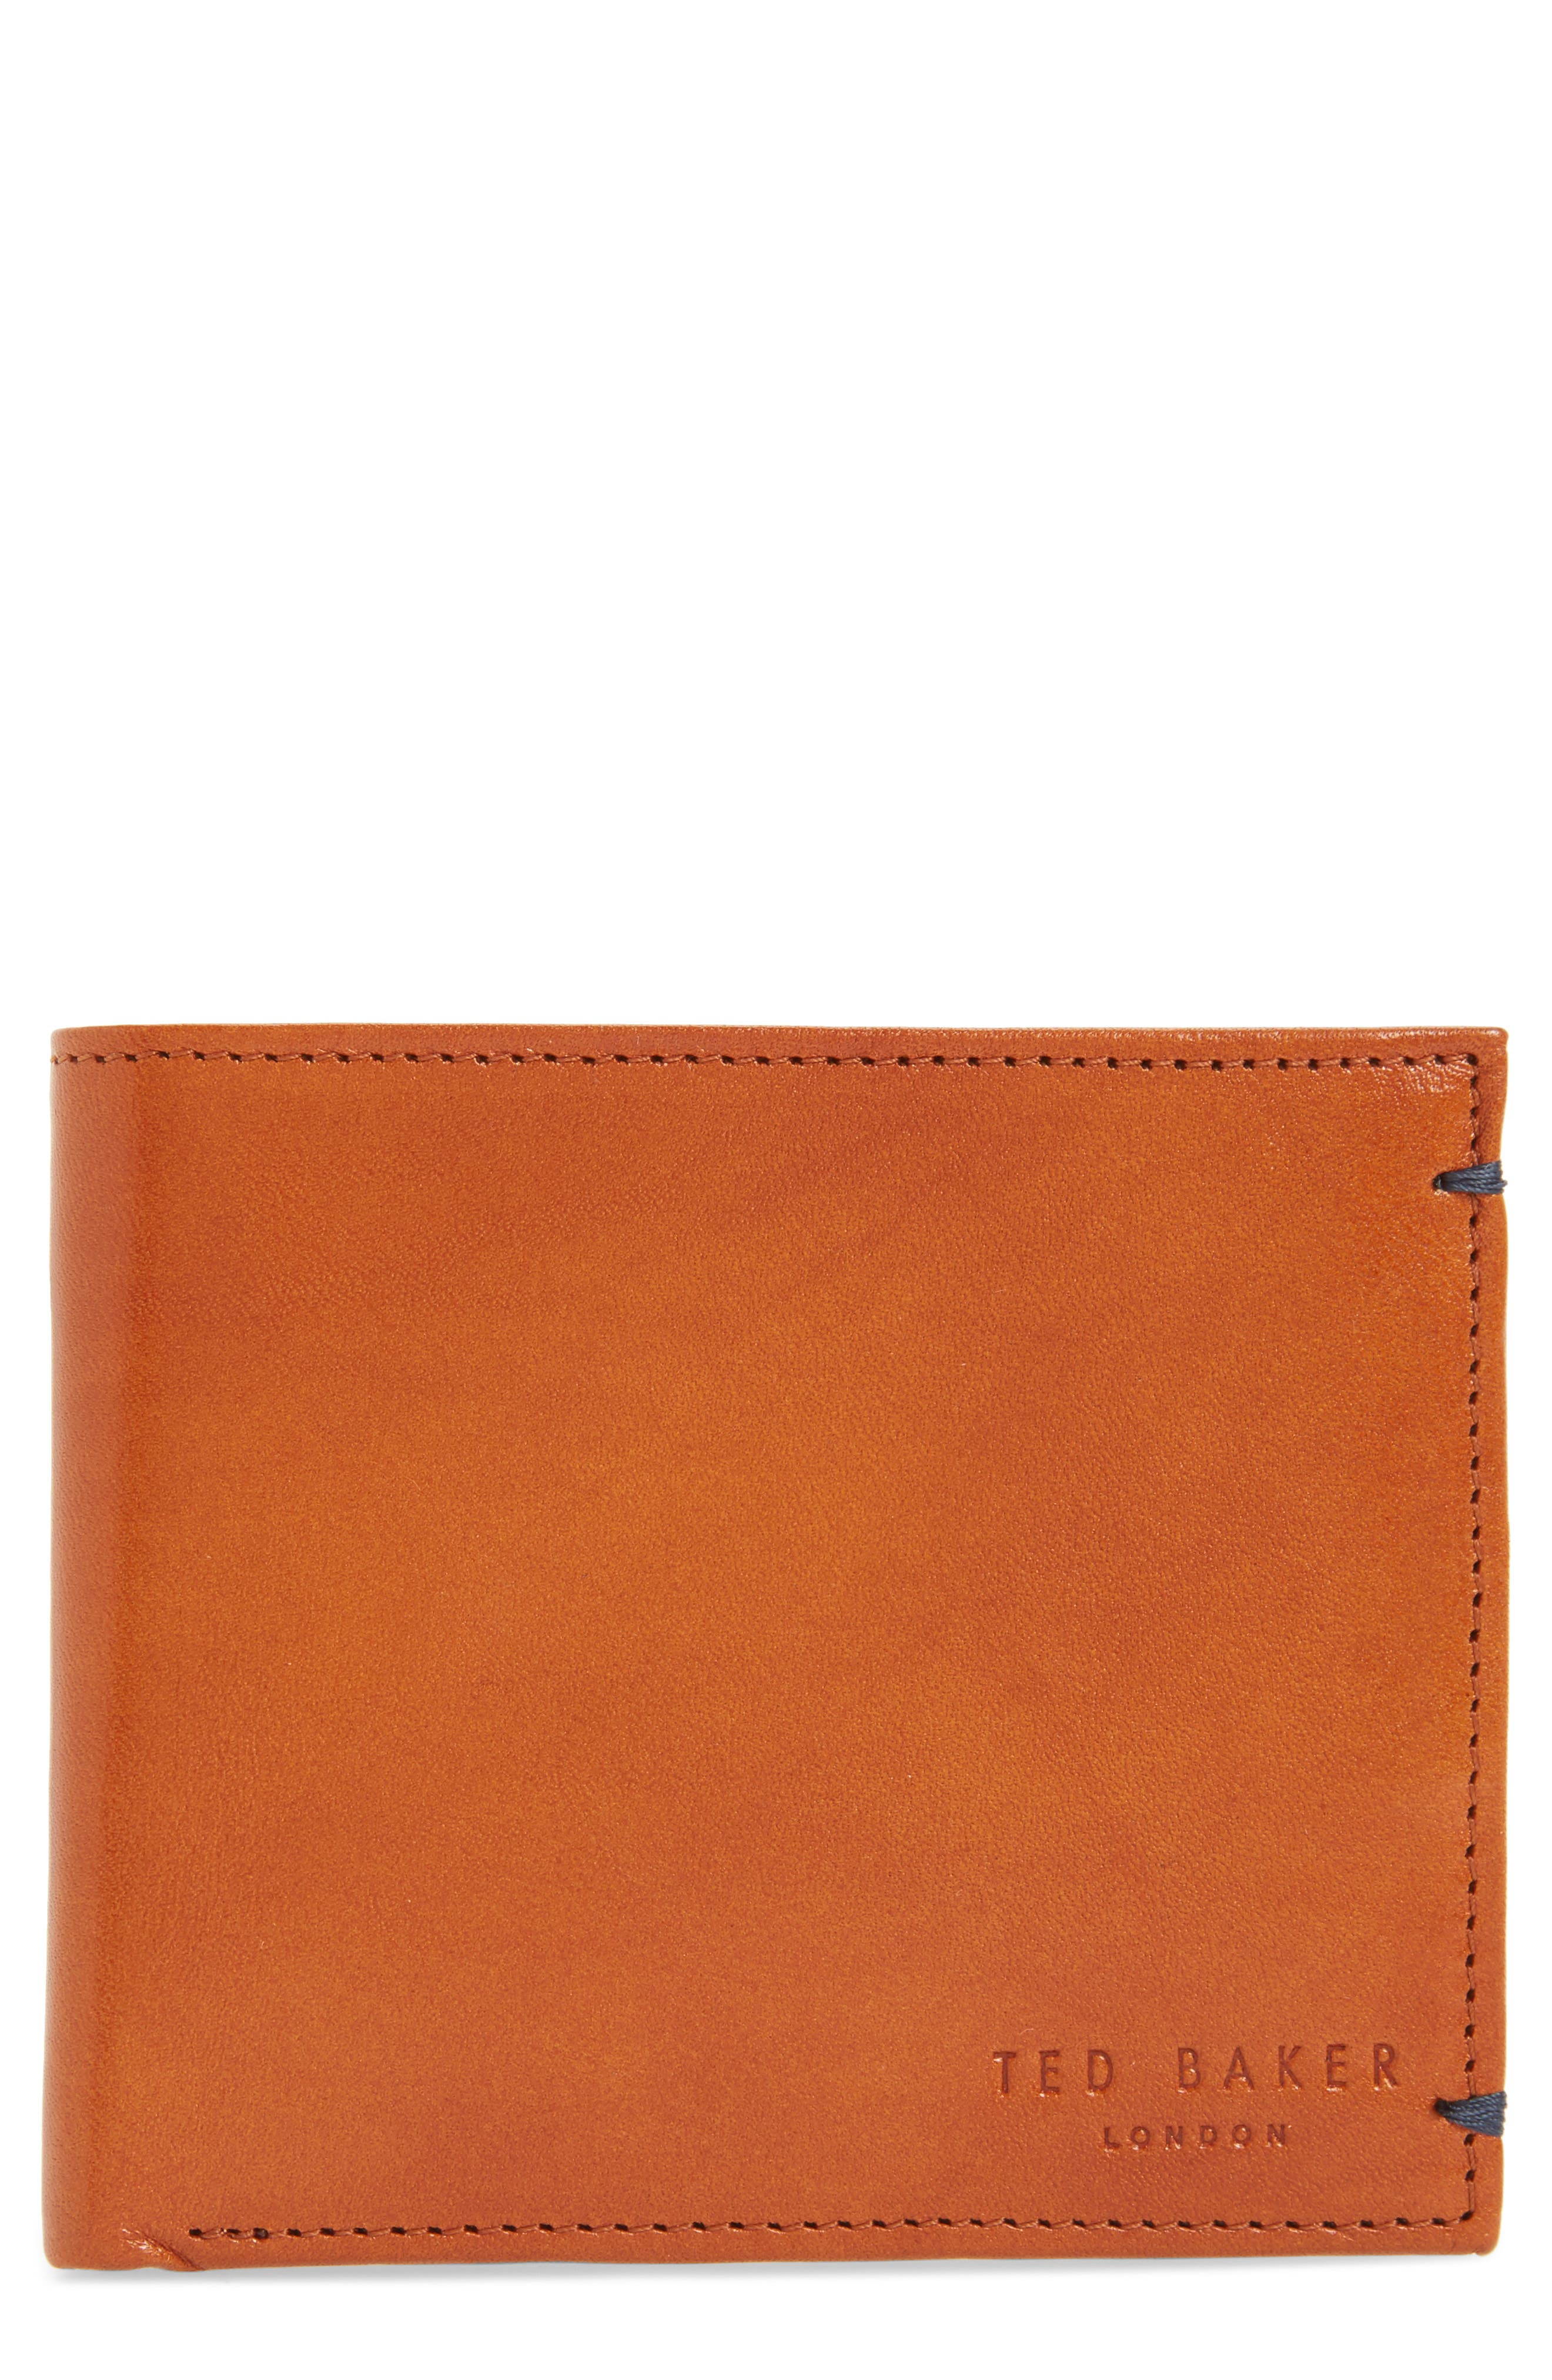 Vivid Leather Wallet,                         Main,                         color, 217